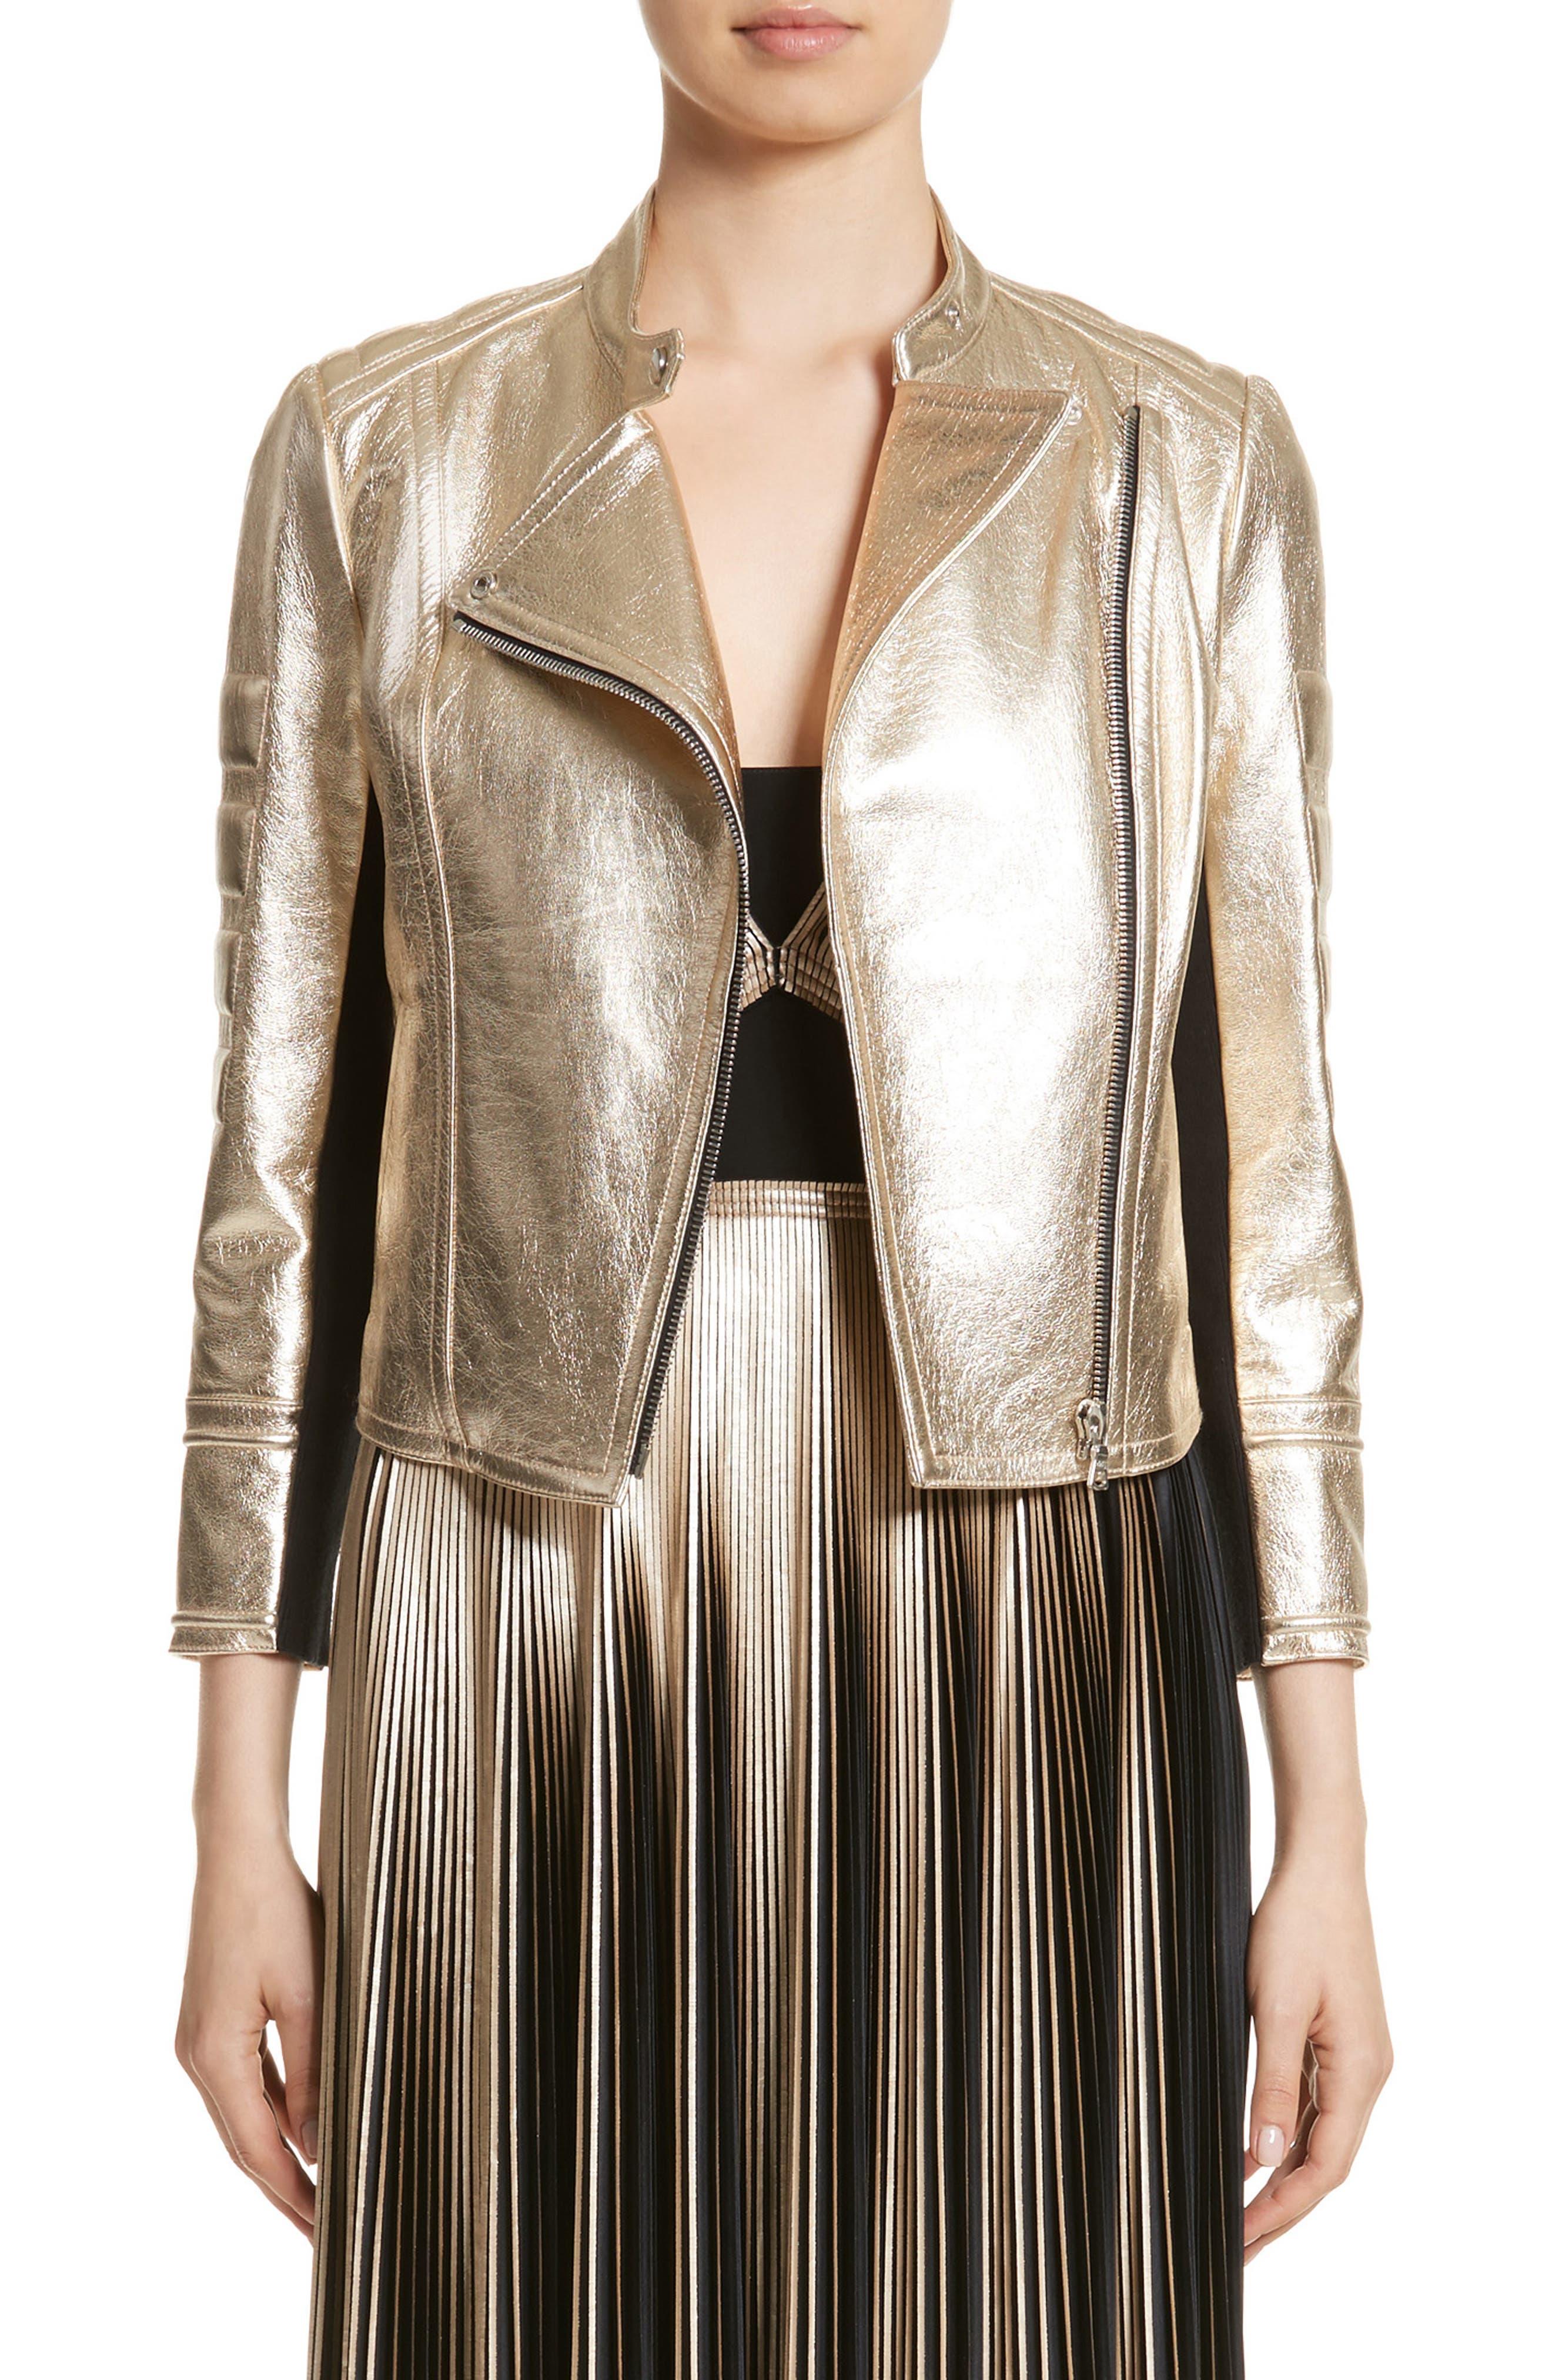 Main Image - Yigal Azrouël Foiled Metallic Leather Moto Jacket